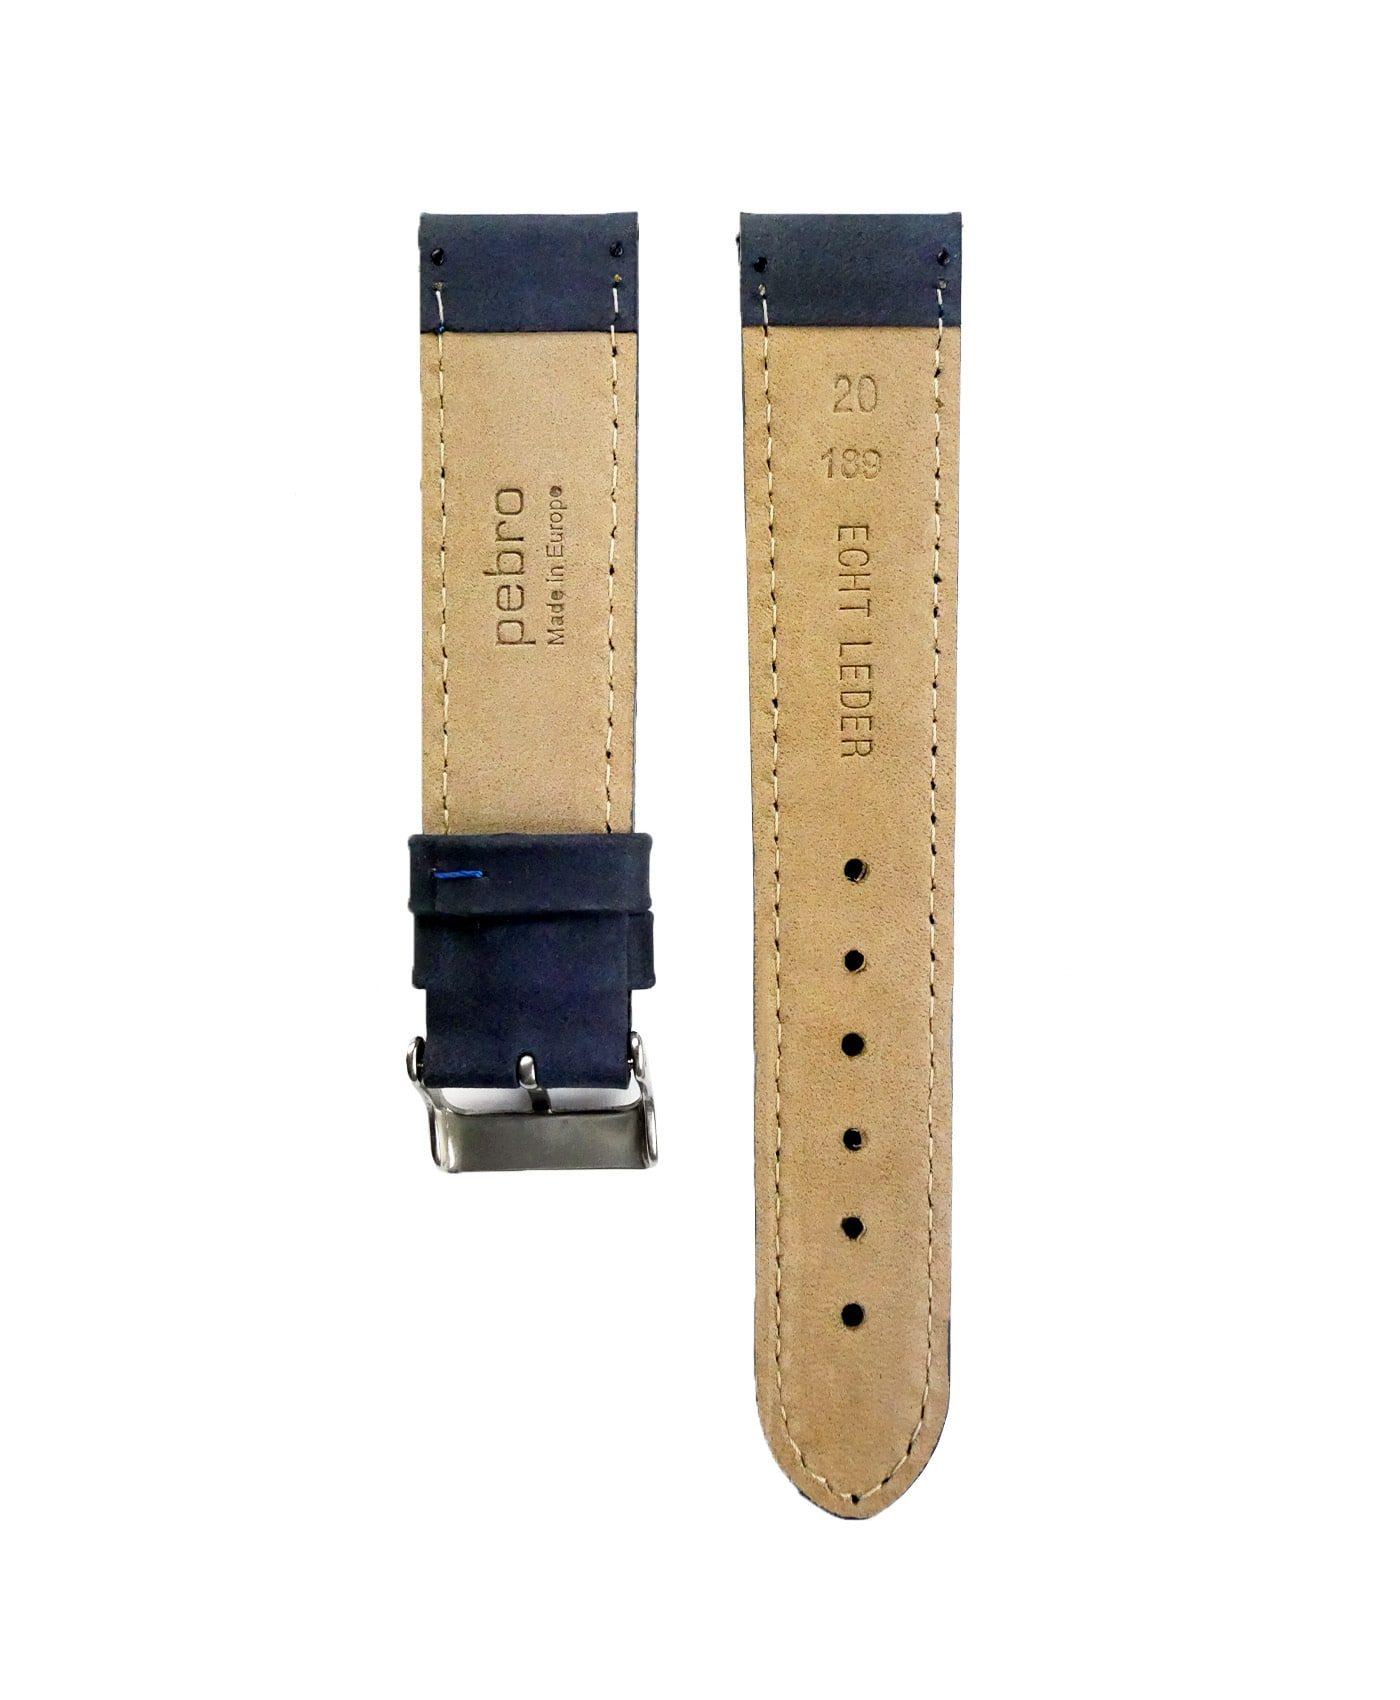 Pebro Premium Calfskin Watch Strap Blue No 189 back